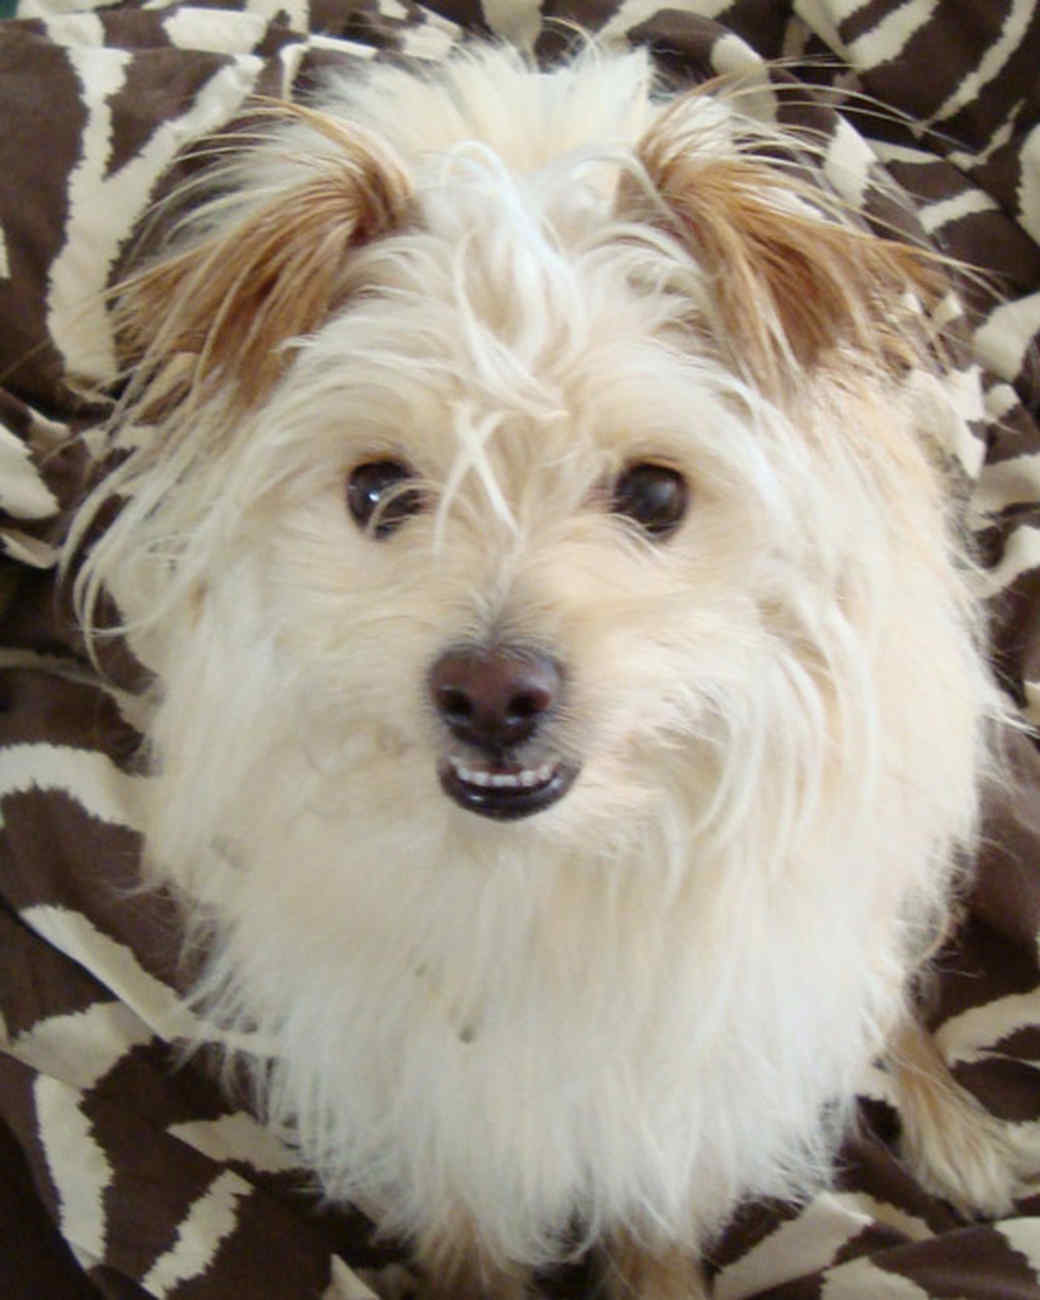 pets_adoption_6383262_122717_14090785.jpg